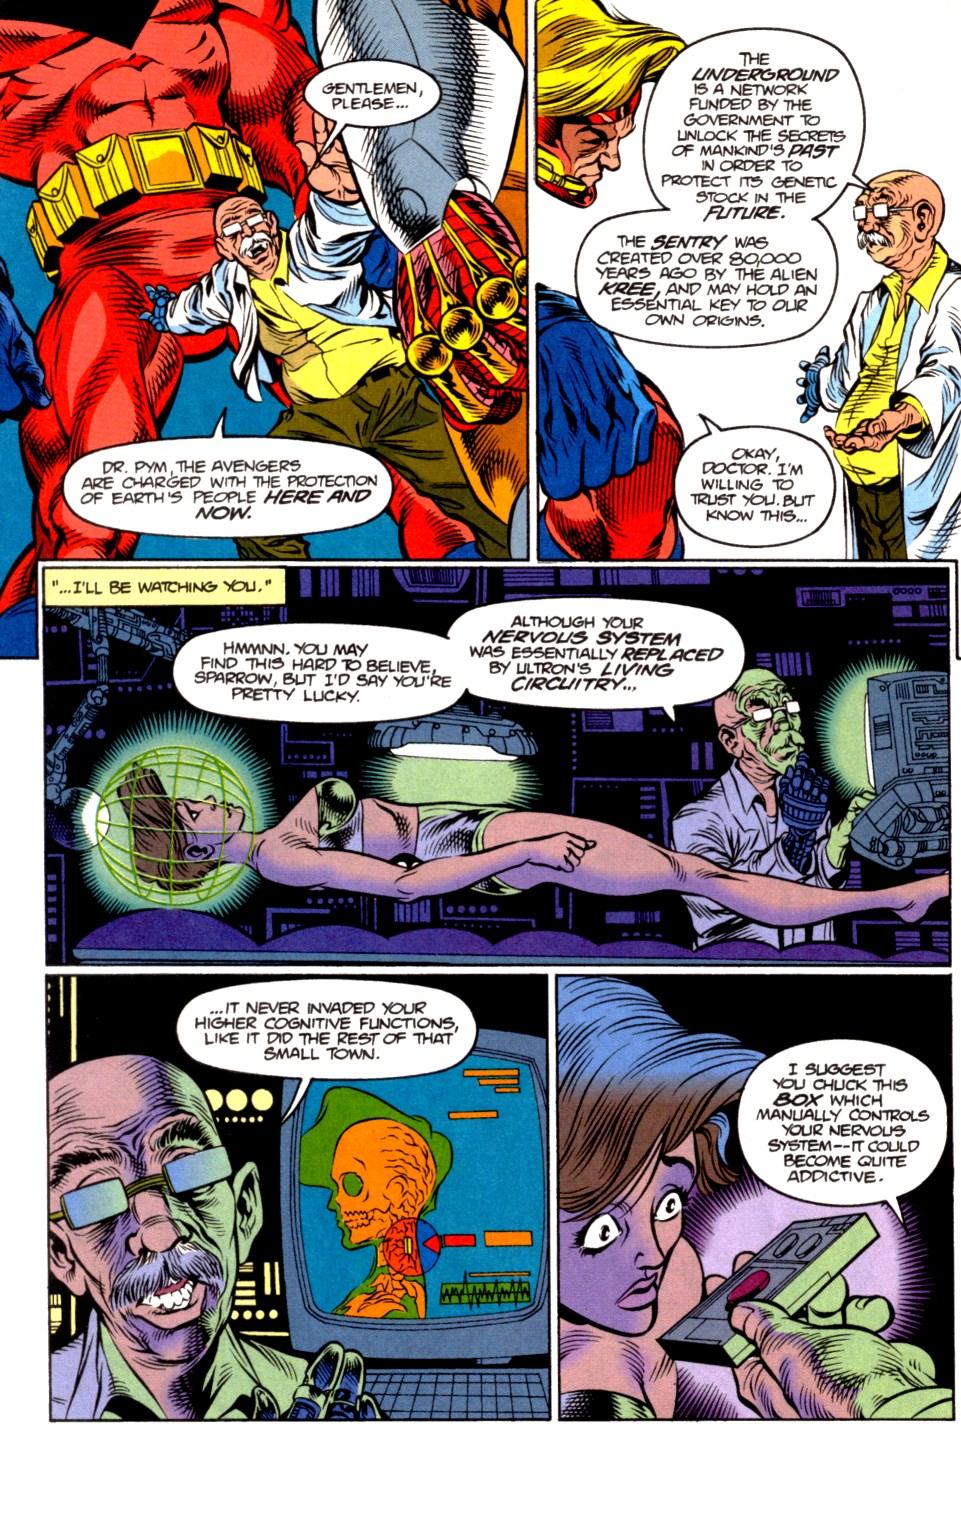 Read online Blackwulf comic -  Issue #6 - 6